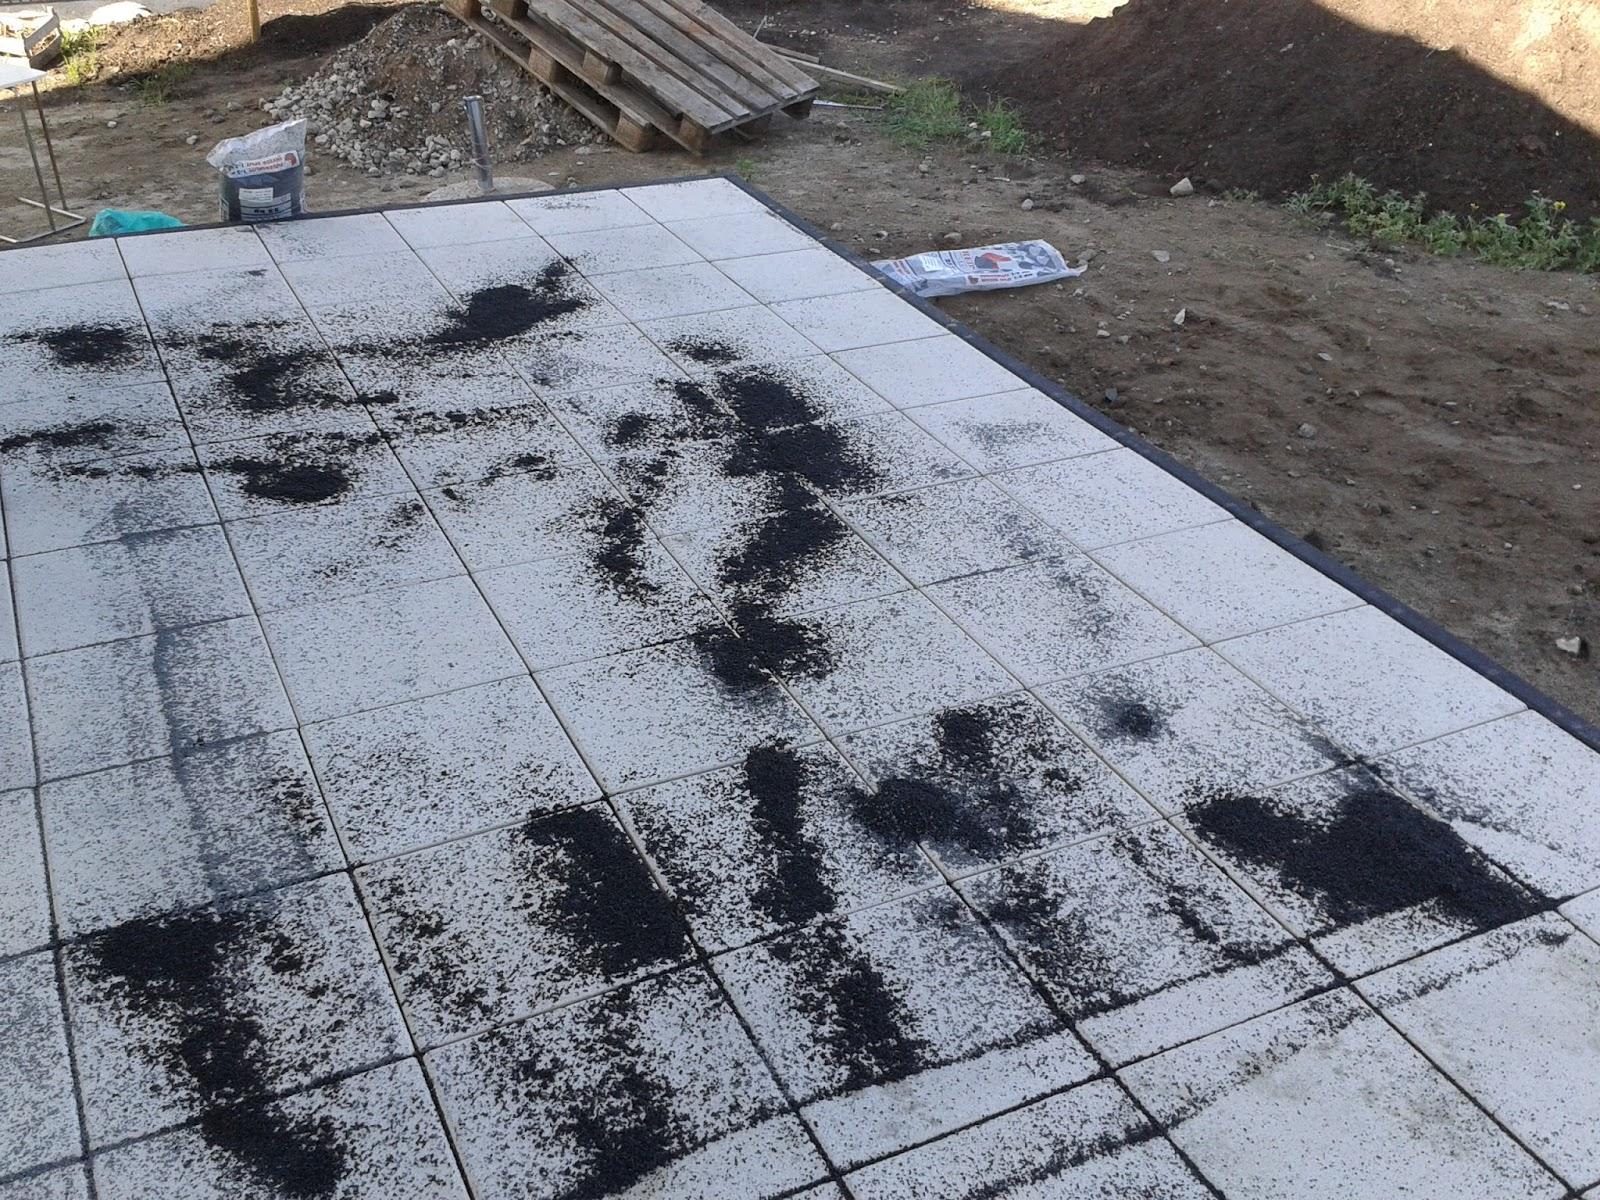 terrassenplatten in splitt verlegen feinsteinzeug. Black Bedroom Furniture Sets. Home Design Ideas